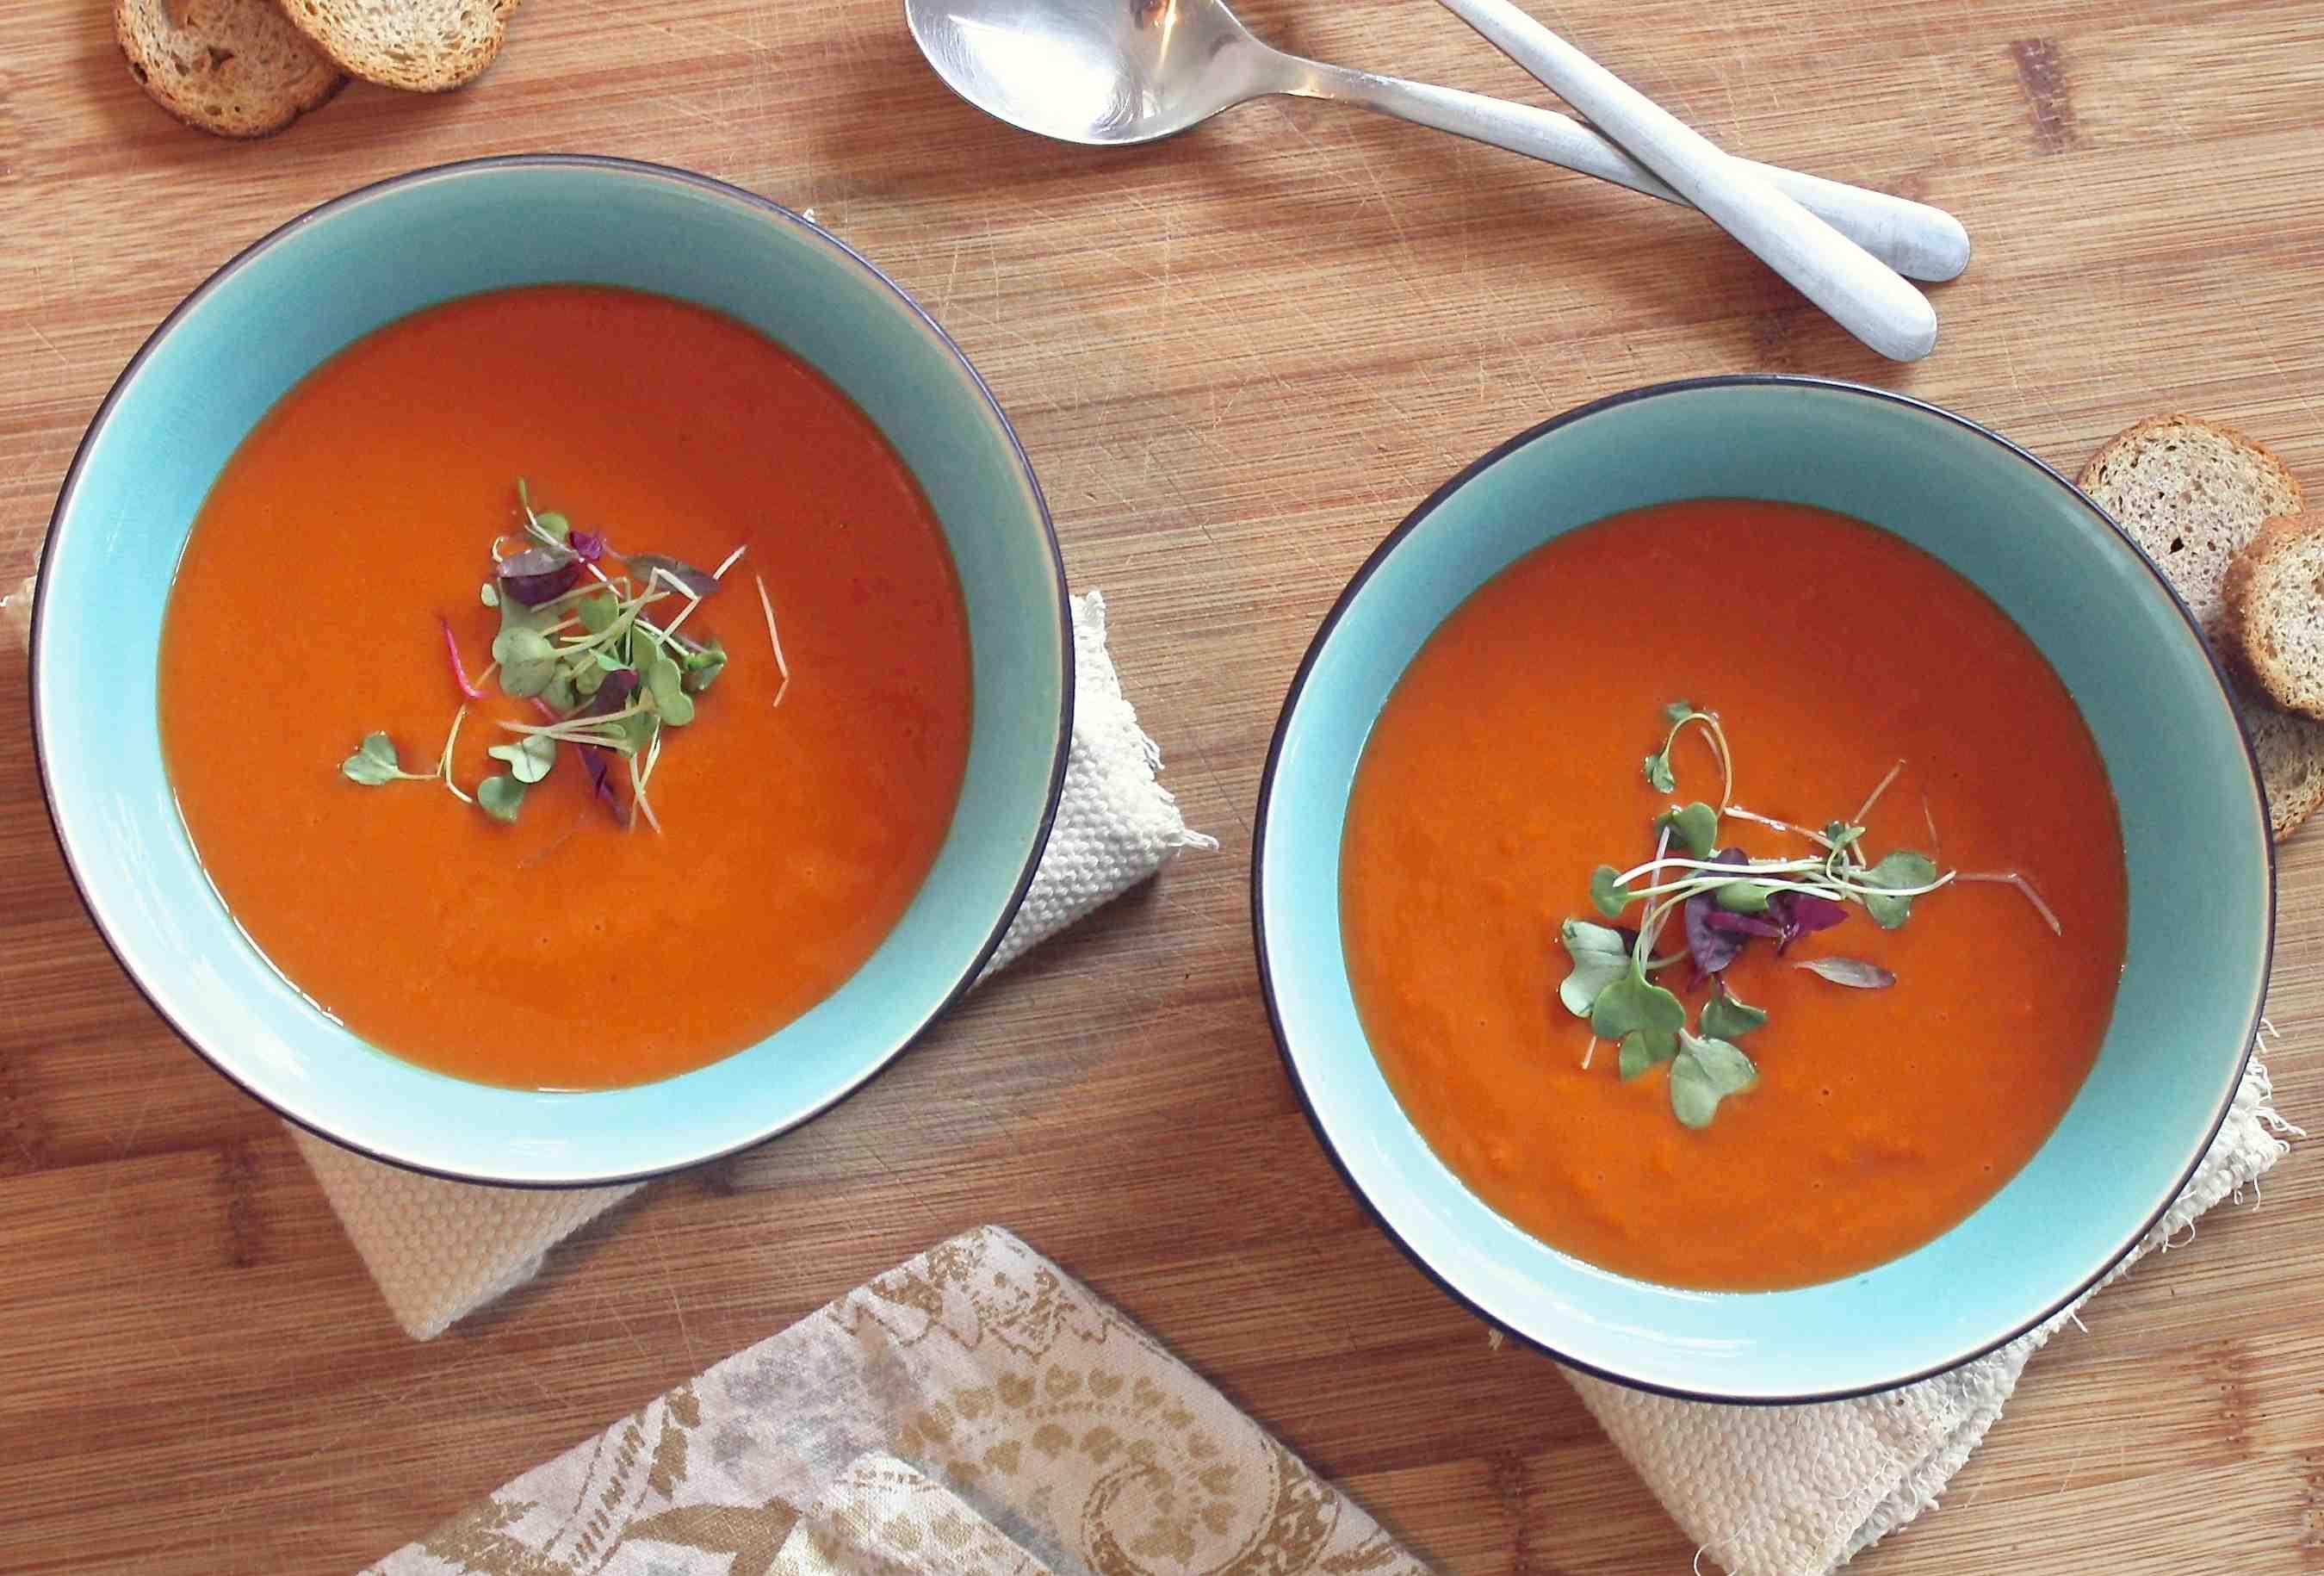 Tomato, Basil and Chilli Soup